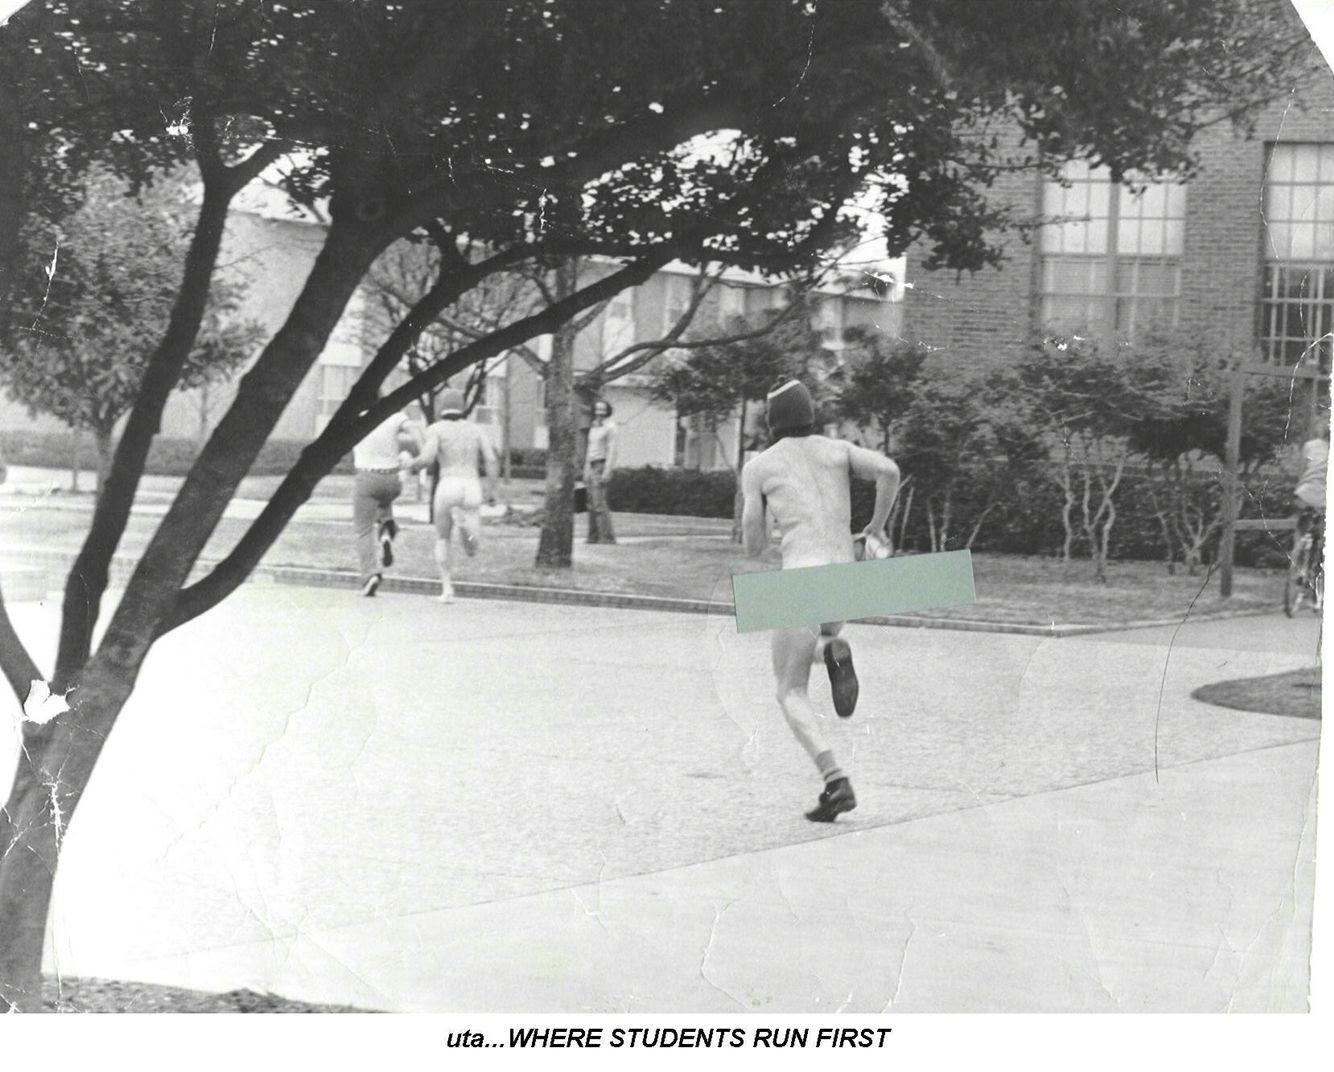 Streaking at UTA in 1974